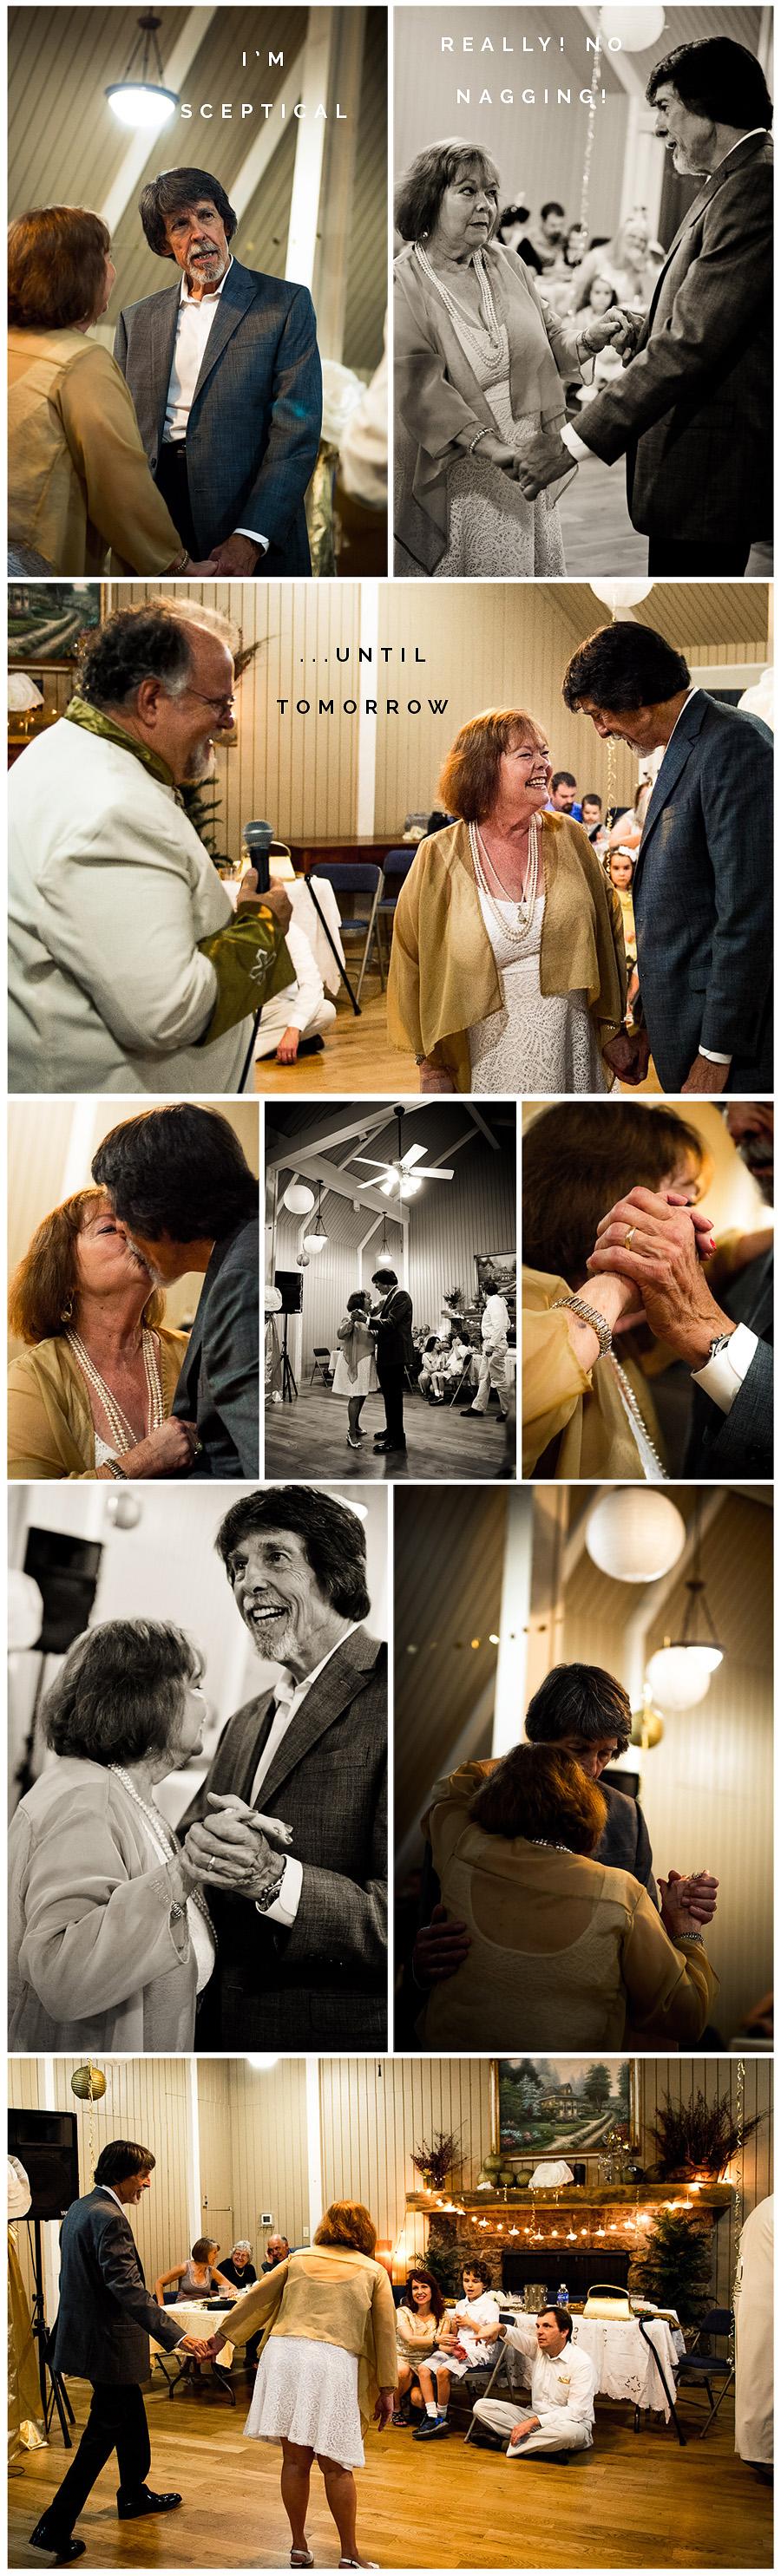 anniversary photos Bedingfield collage 10